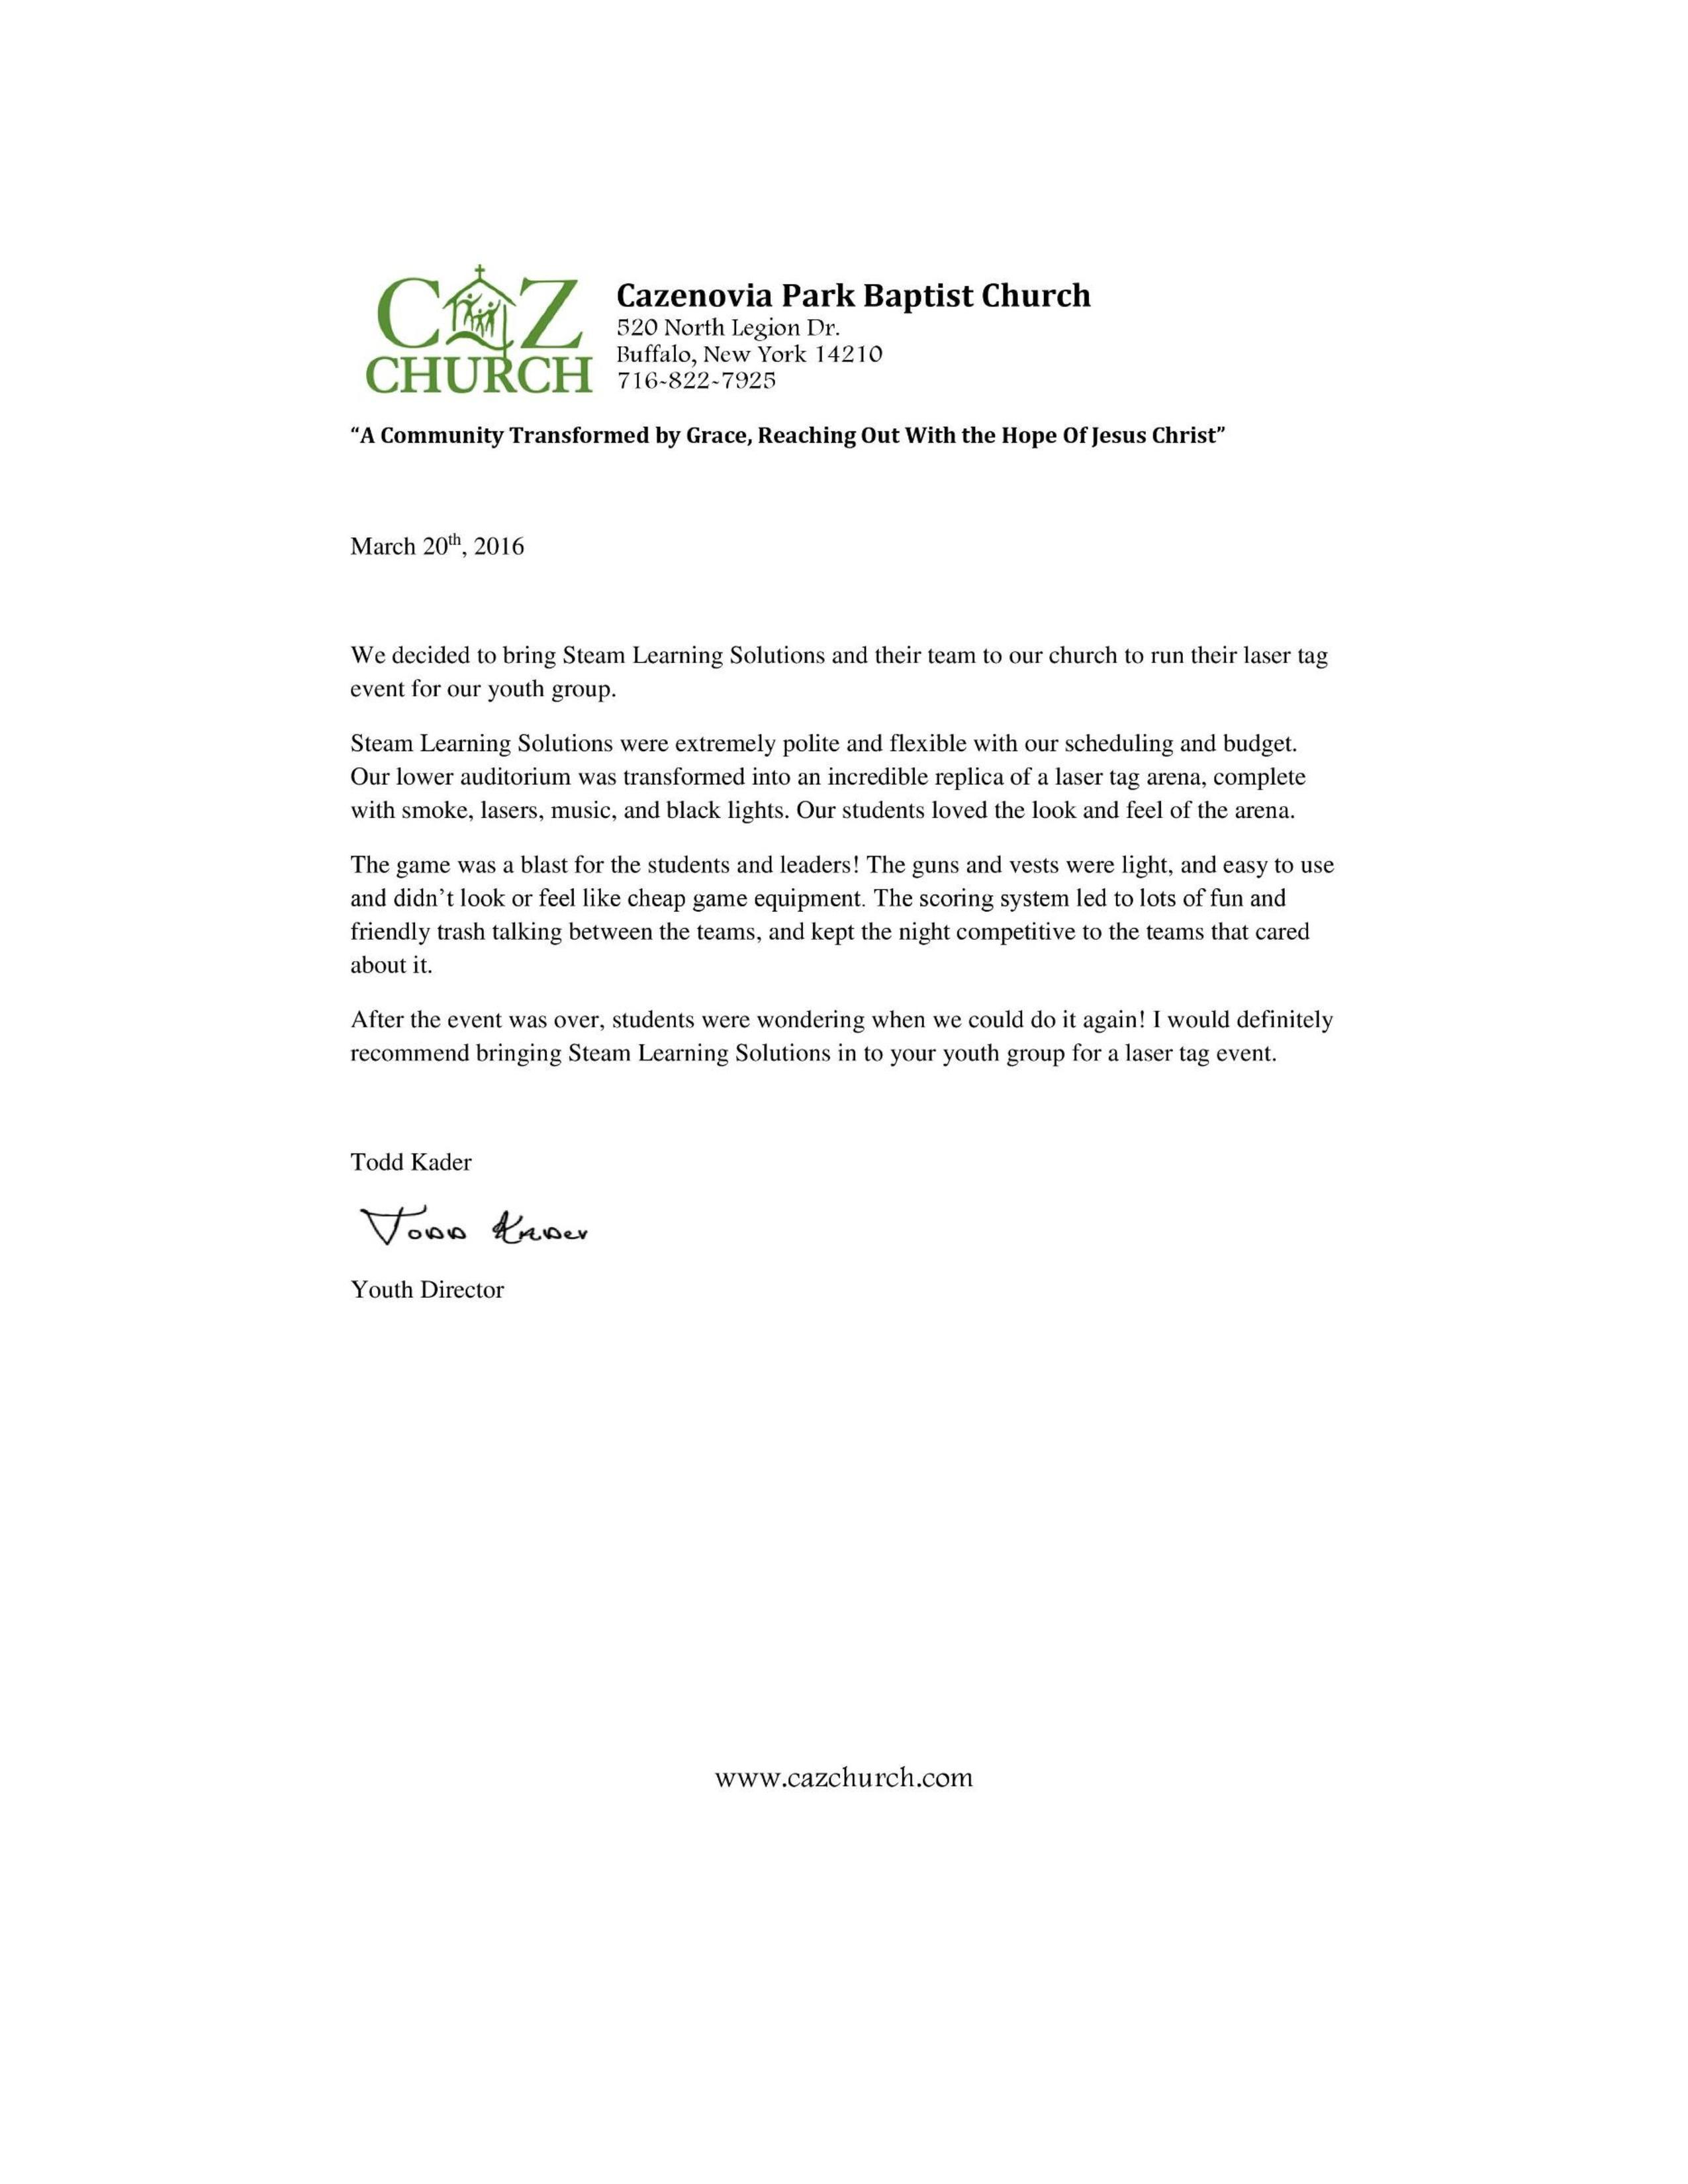 Straus.Business.Testimonials-page-004